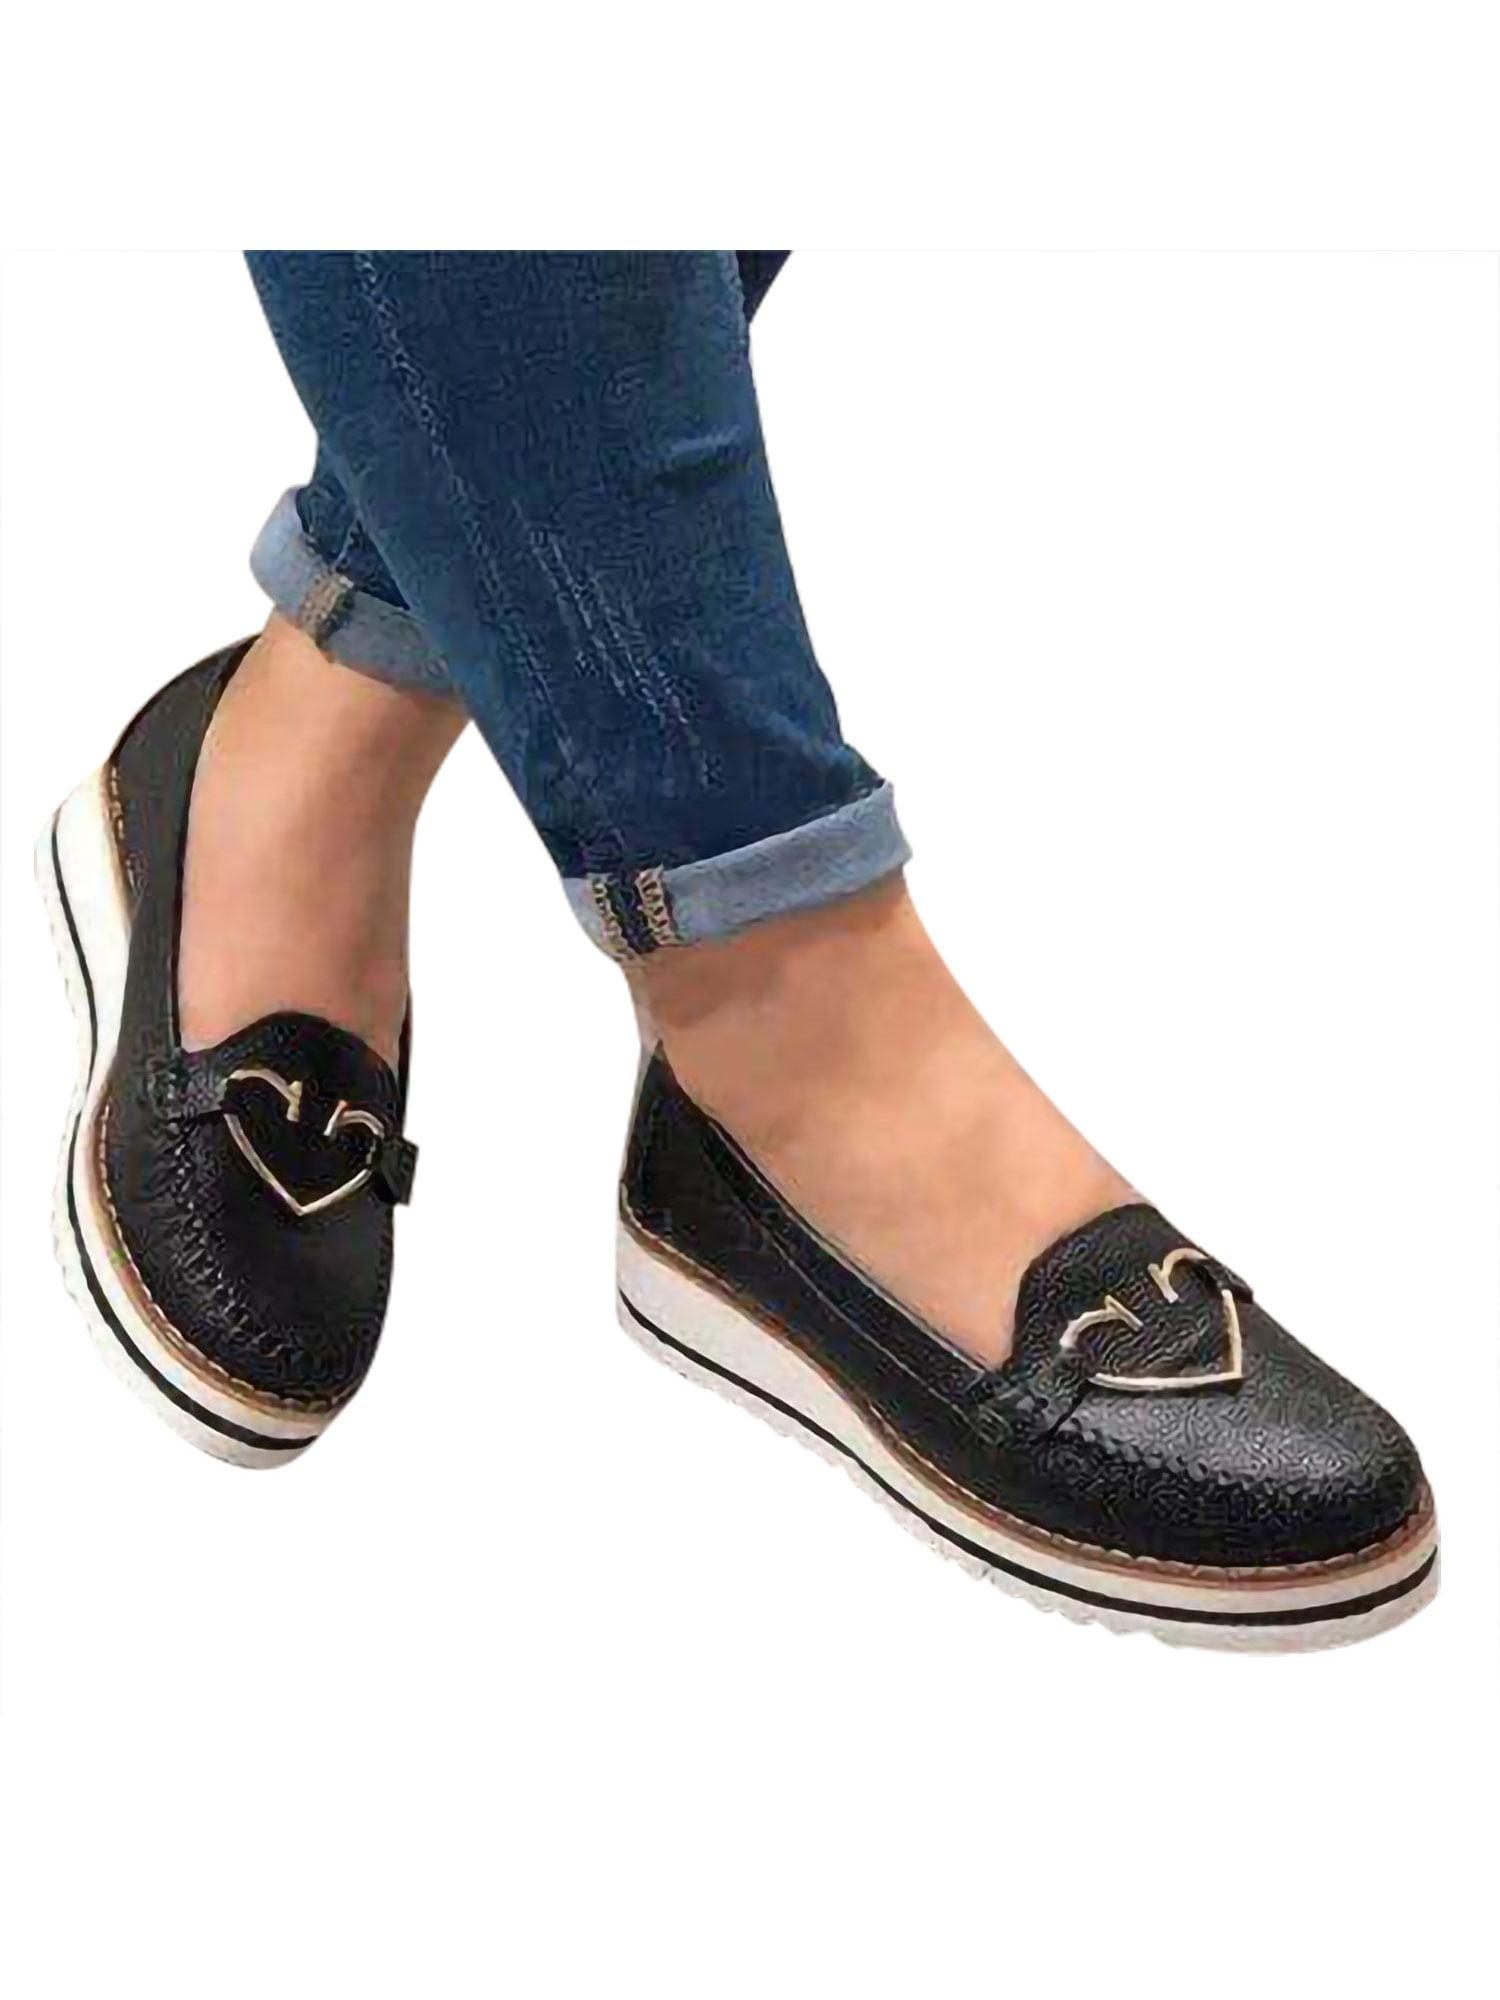 Loafers Flats Low heel platform